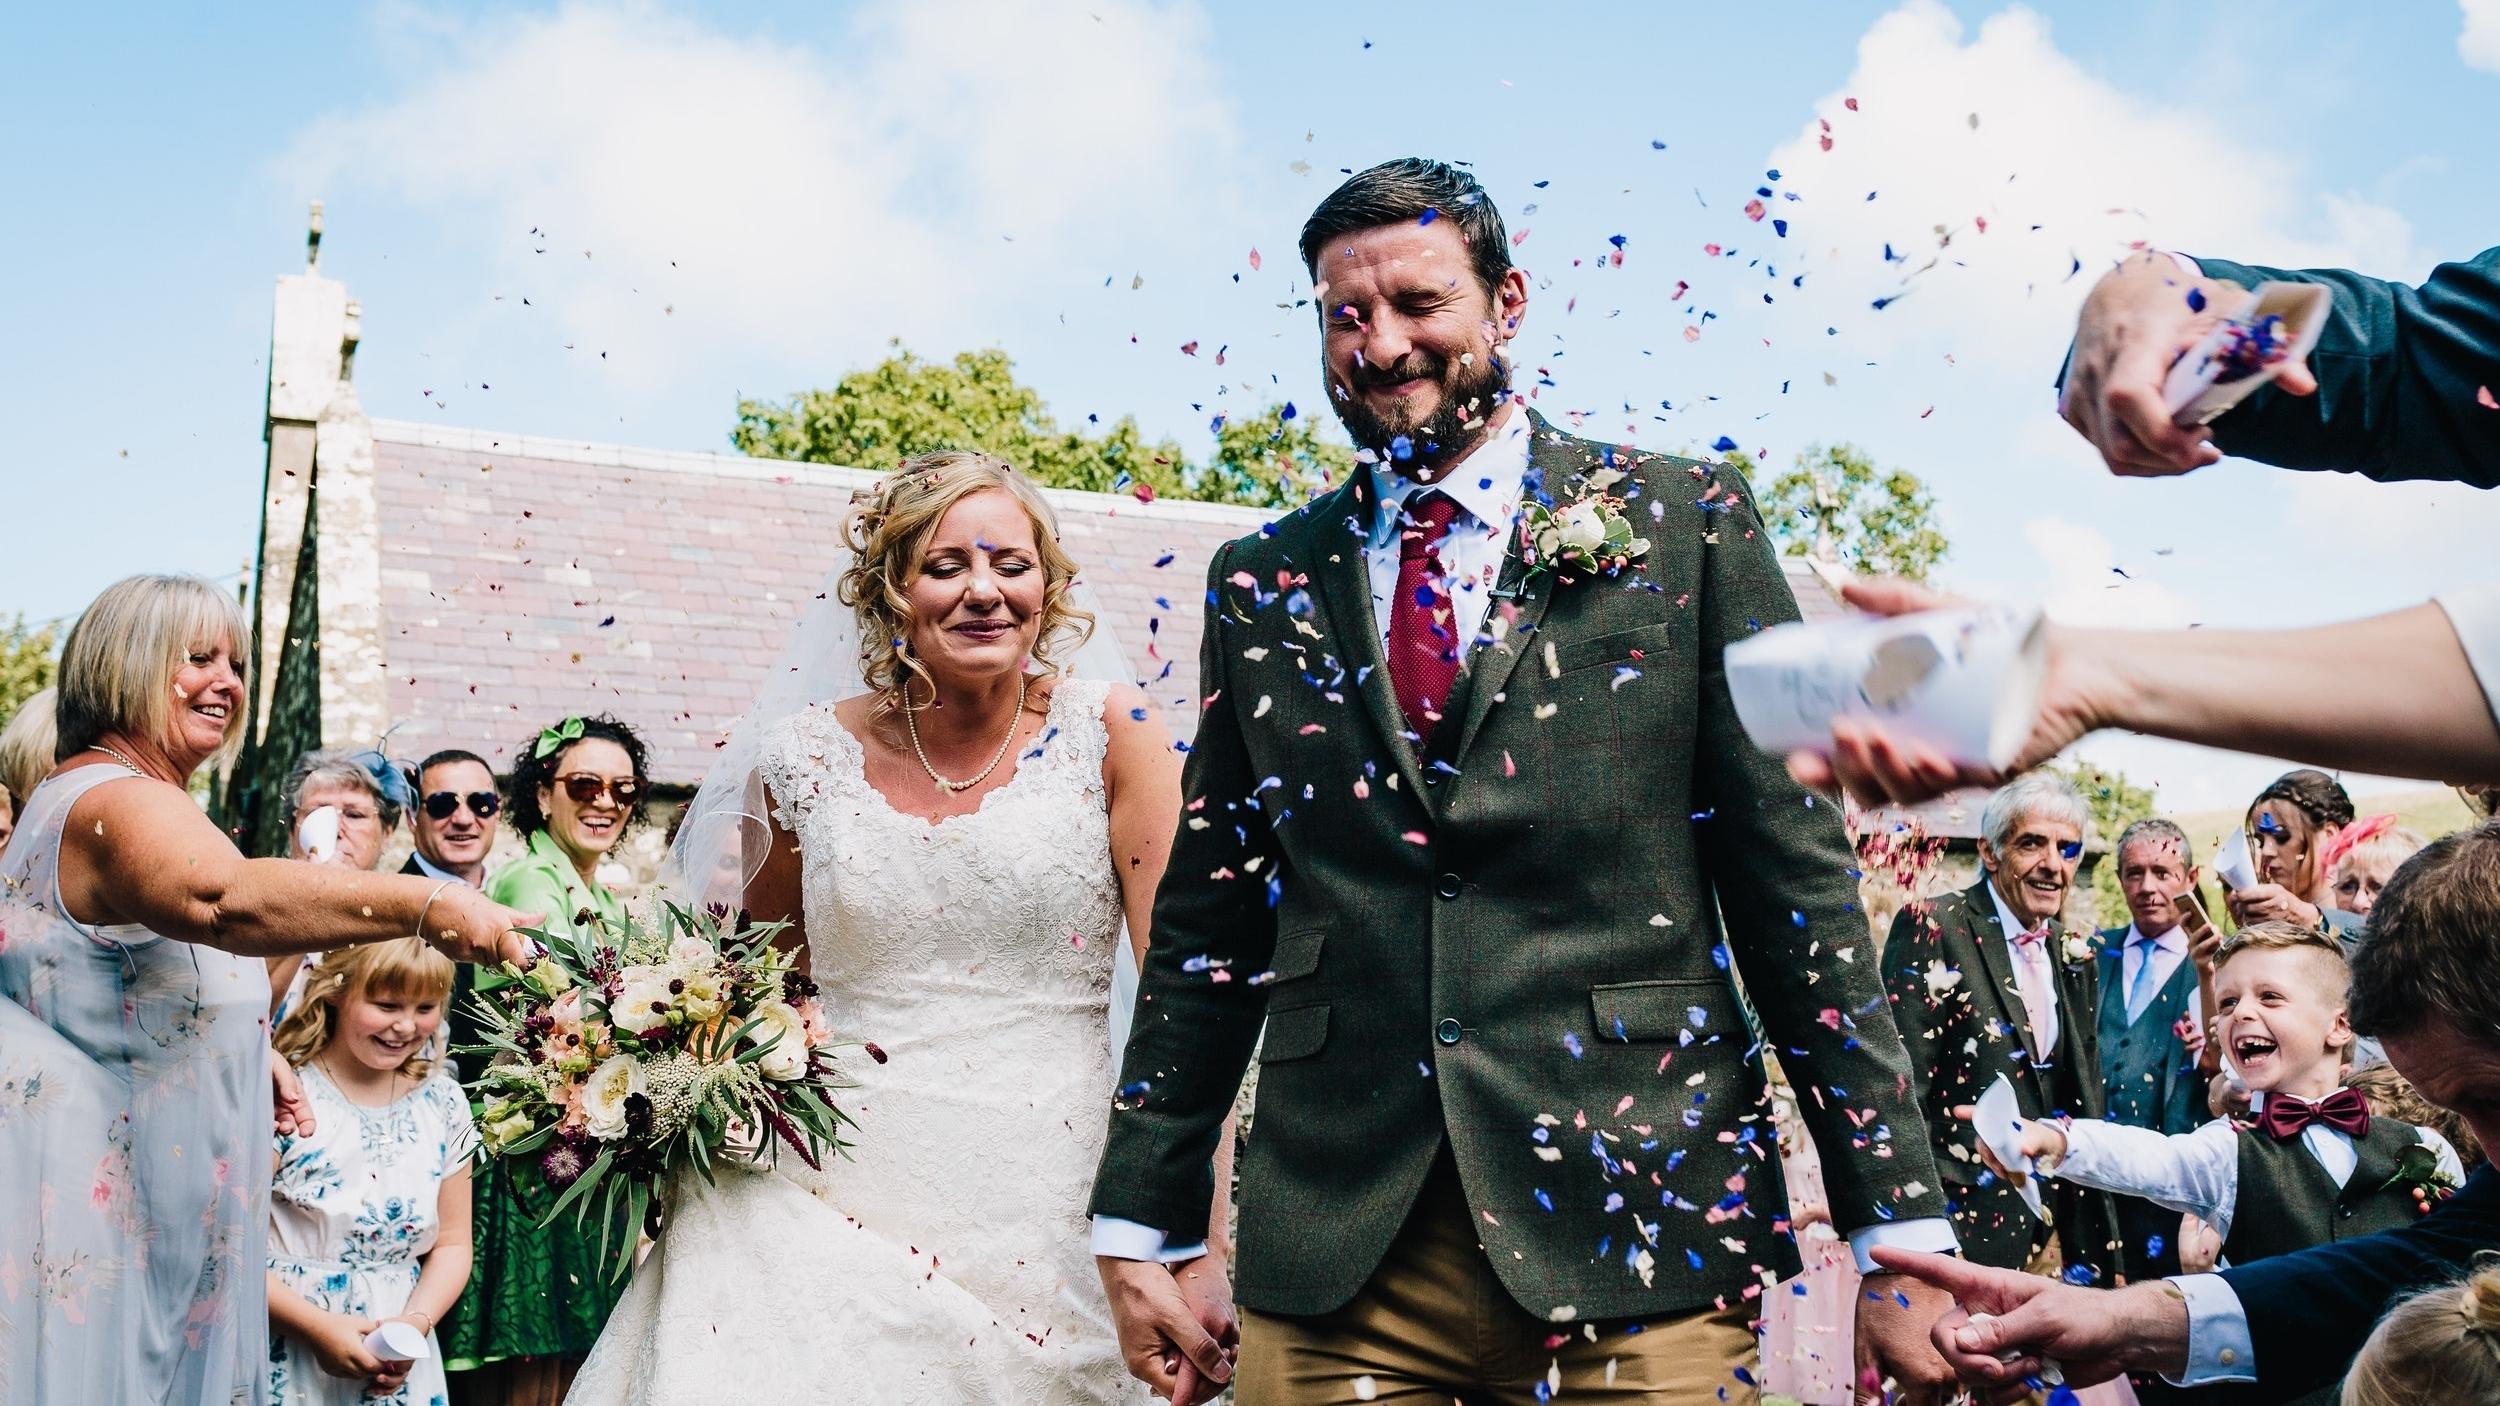 bride and groom confetti wedding picture